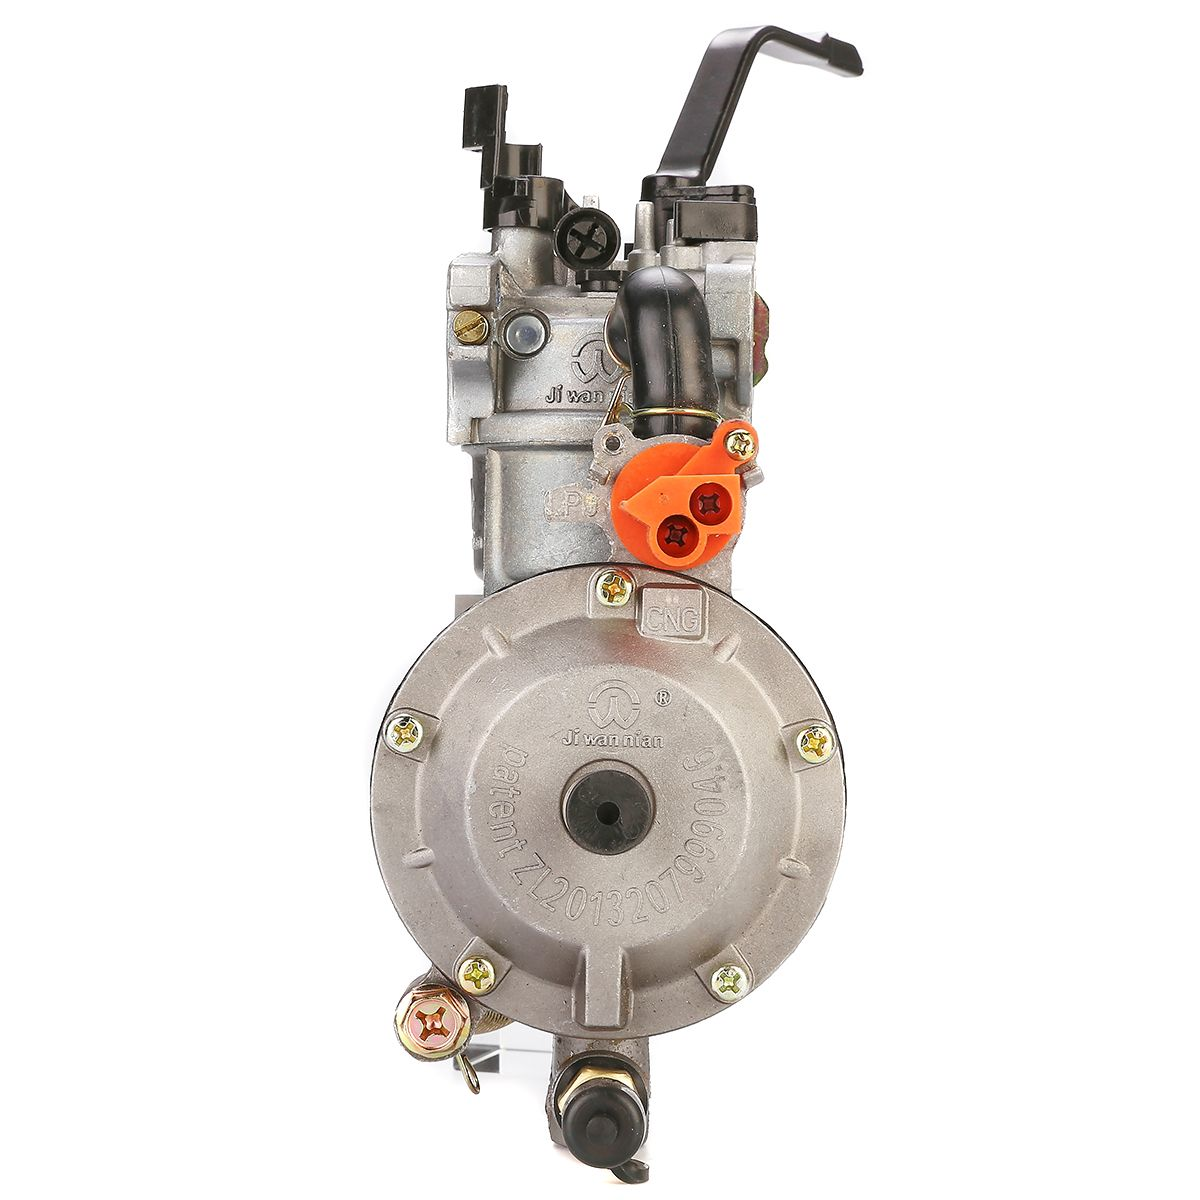 Durable Dual Fuel Carburetor Replace For GX200 170F Generator Engine Carb LPG Conversion Mayitr high quality small engine motor carburetor carb 799727 695412 791886 698620 498051 replace